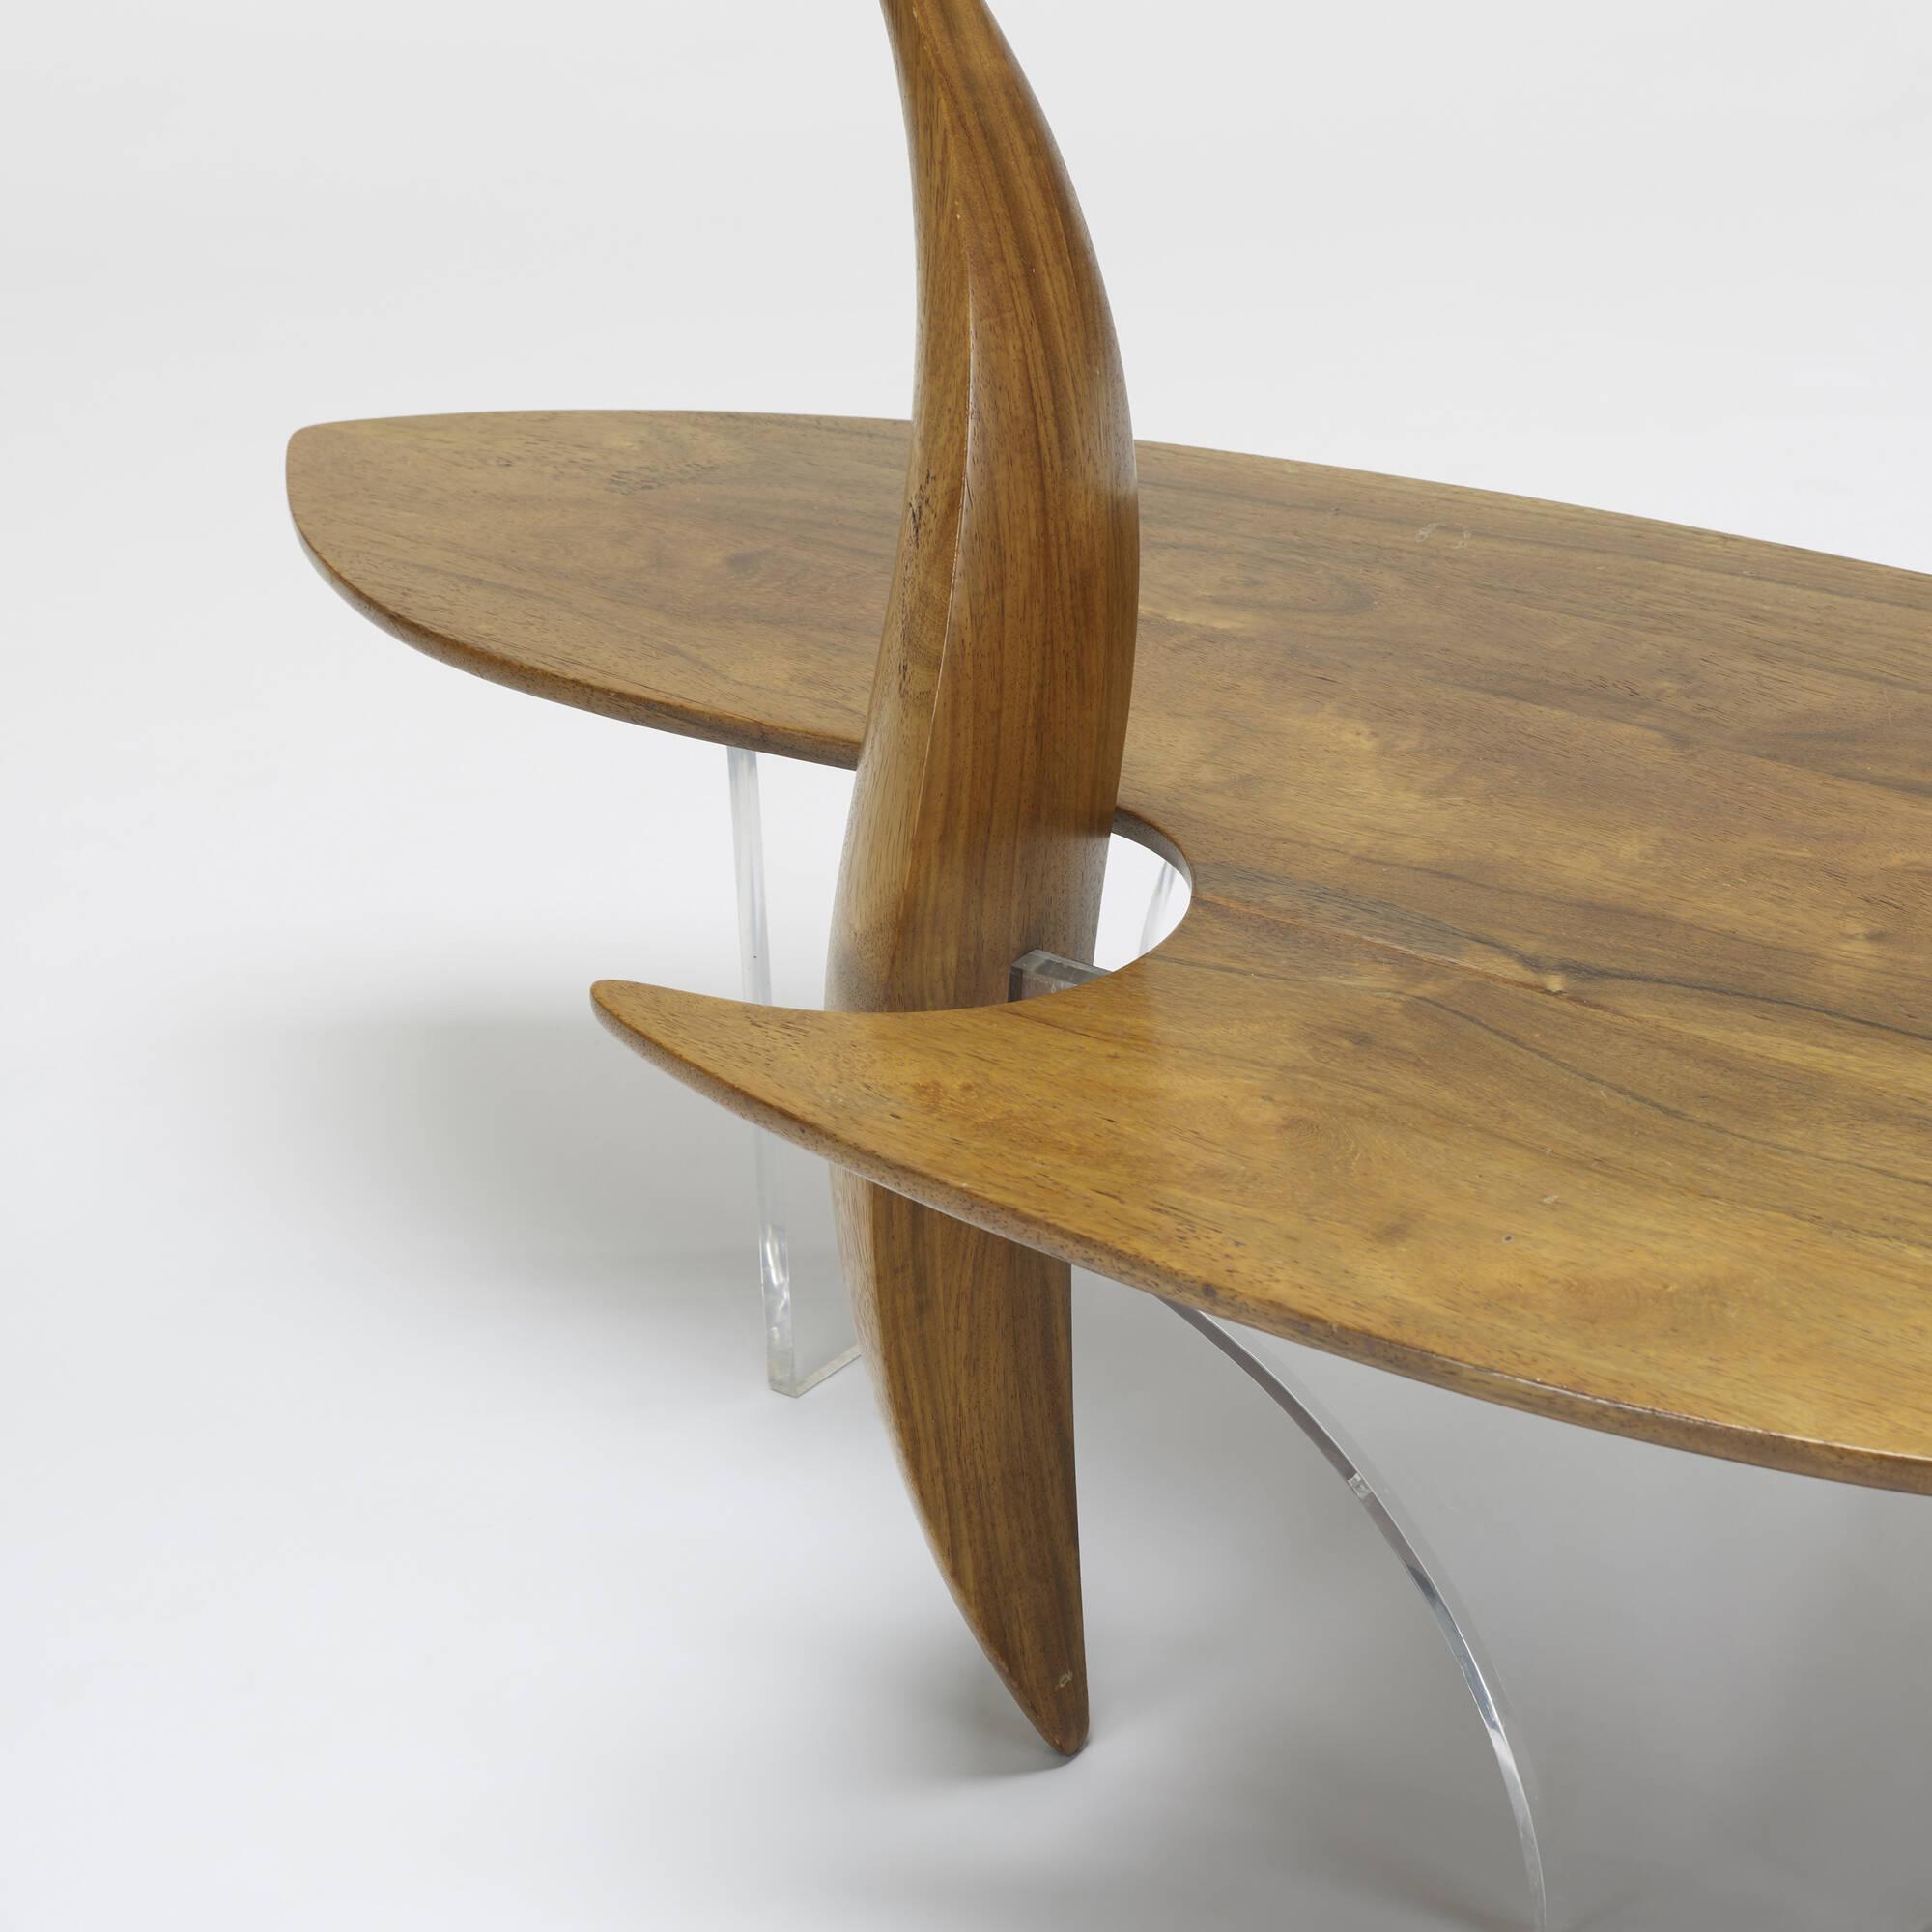 169: Michael Coffey / Encounter coffee table (2 of 2)